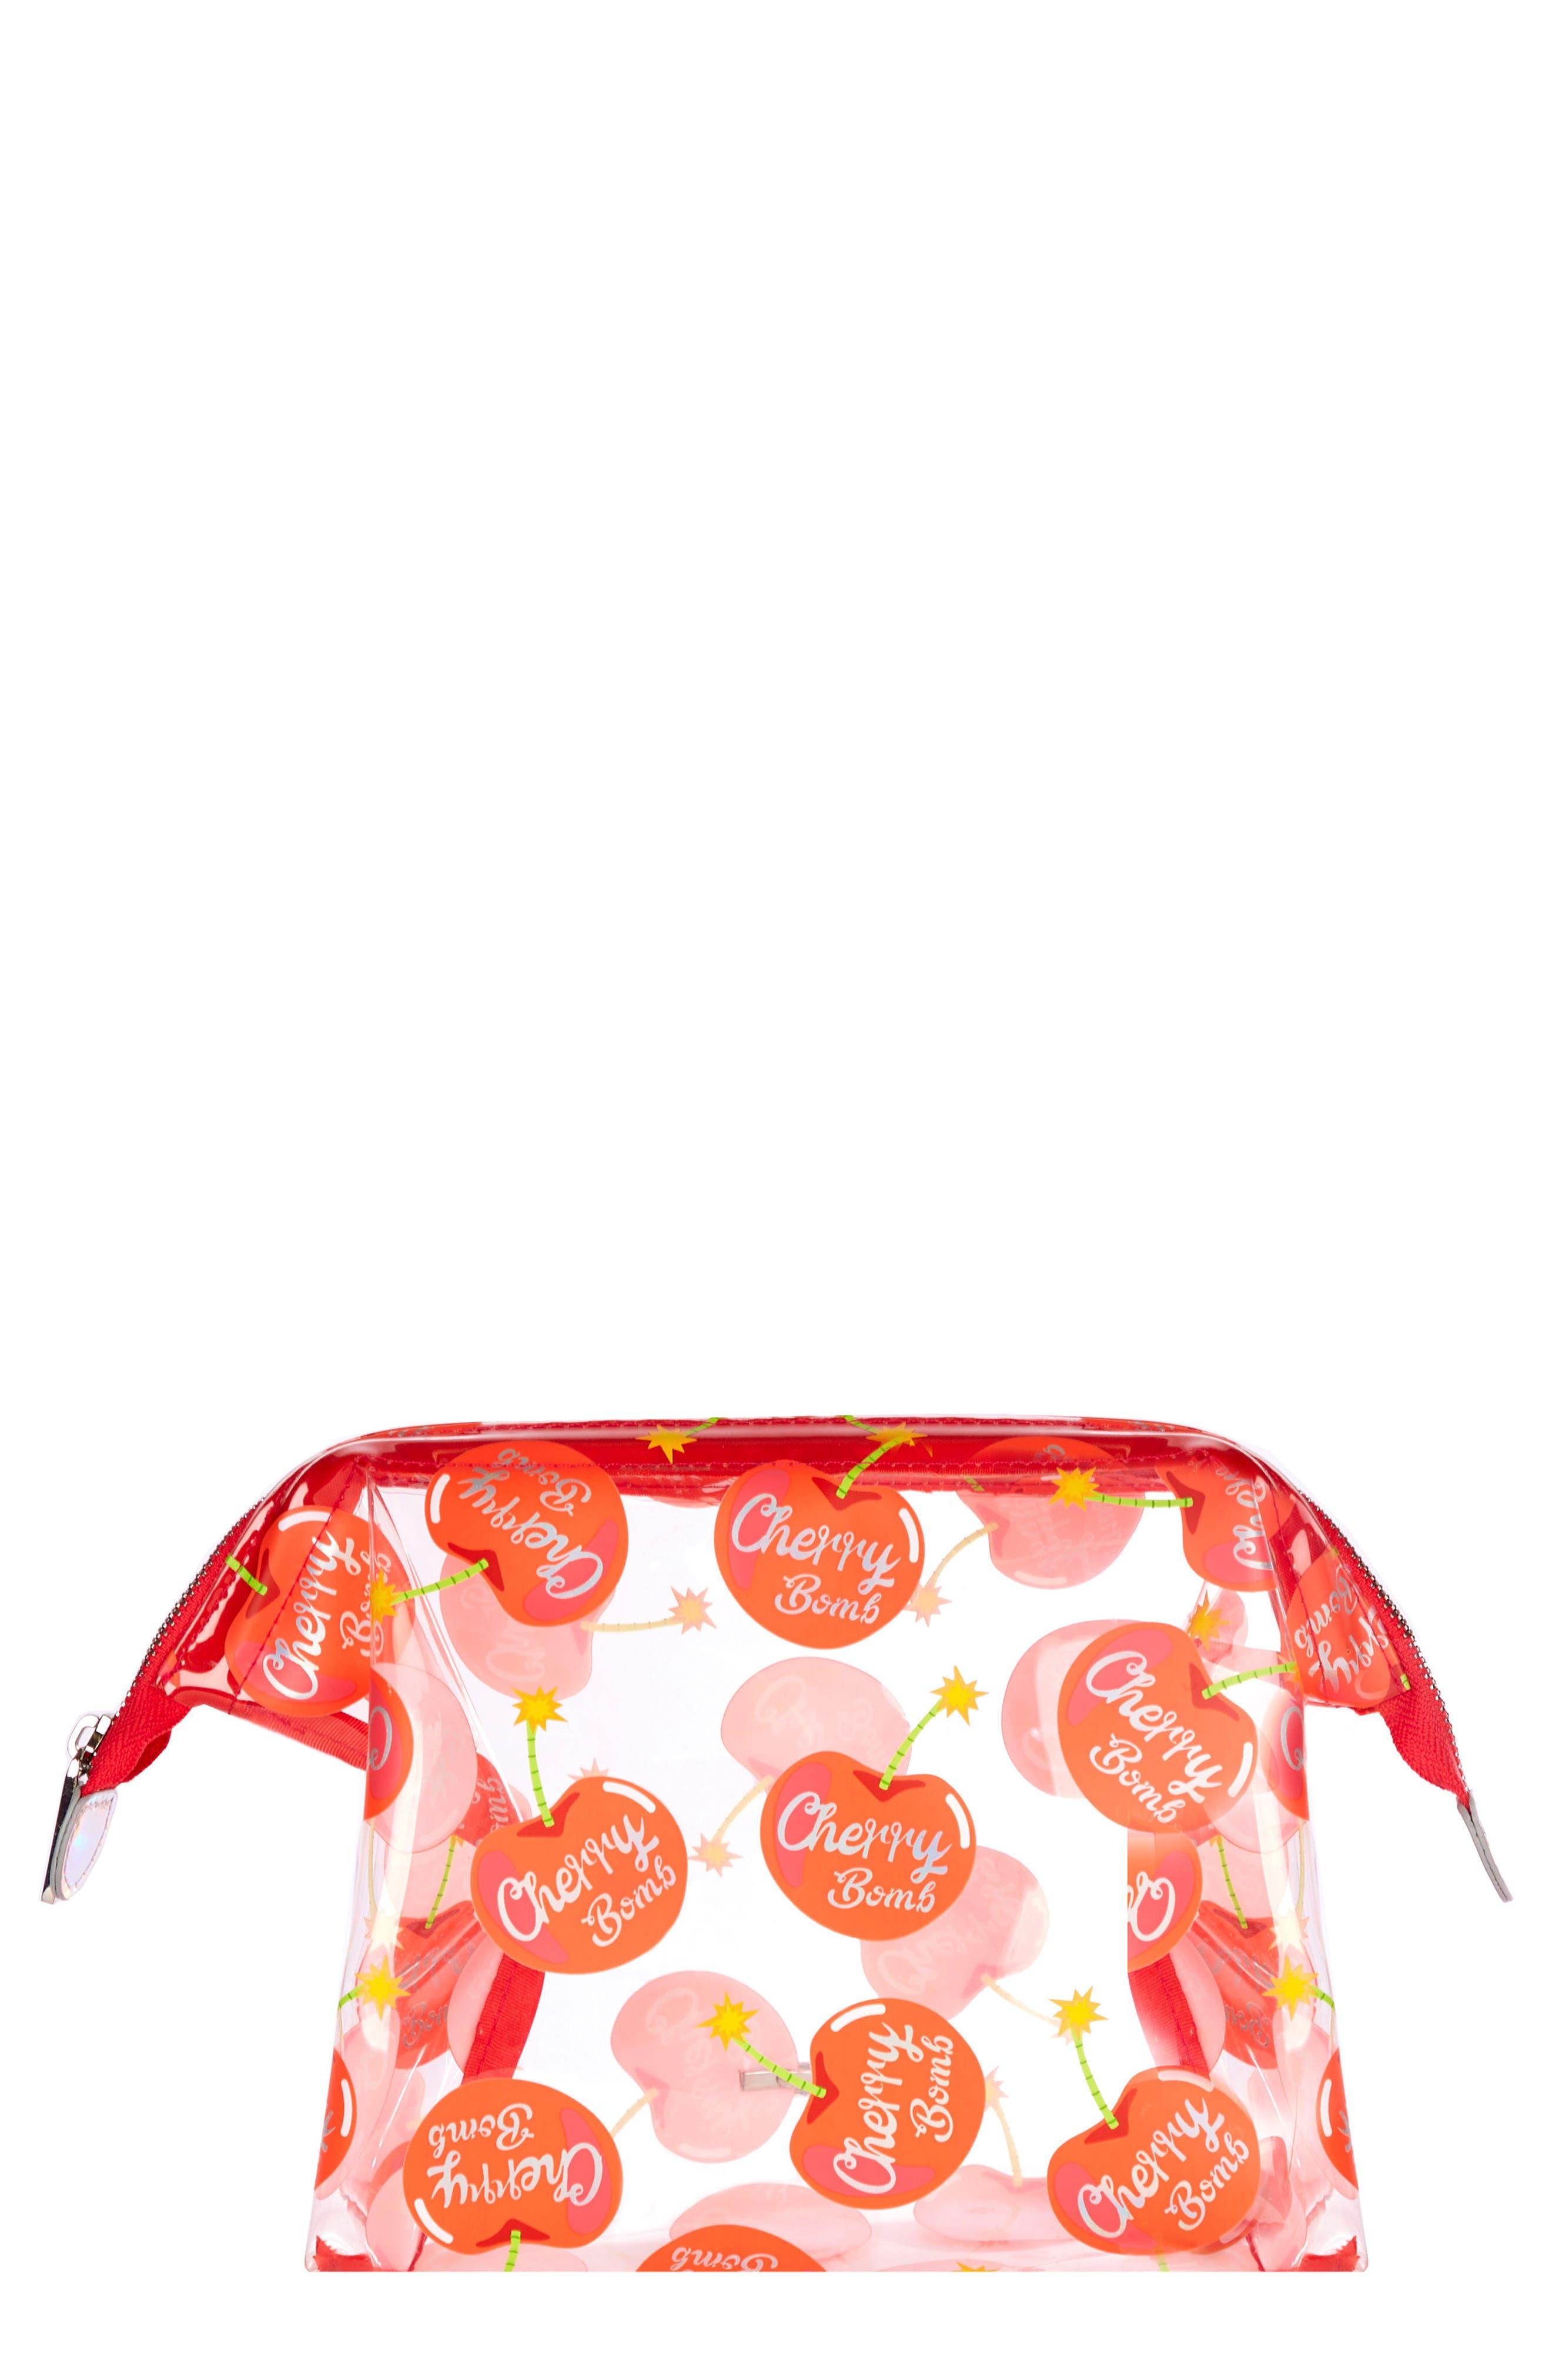 Cherry Bomb Cosmetics Case,                         Main,                         color, NO COLOR